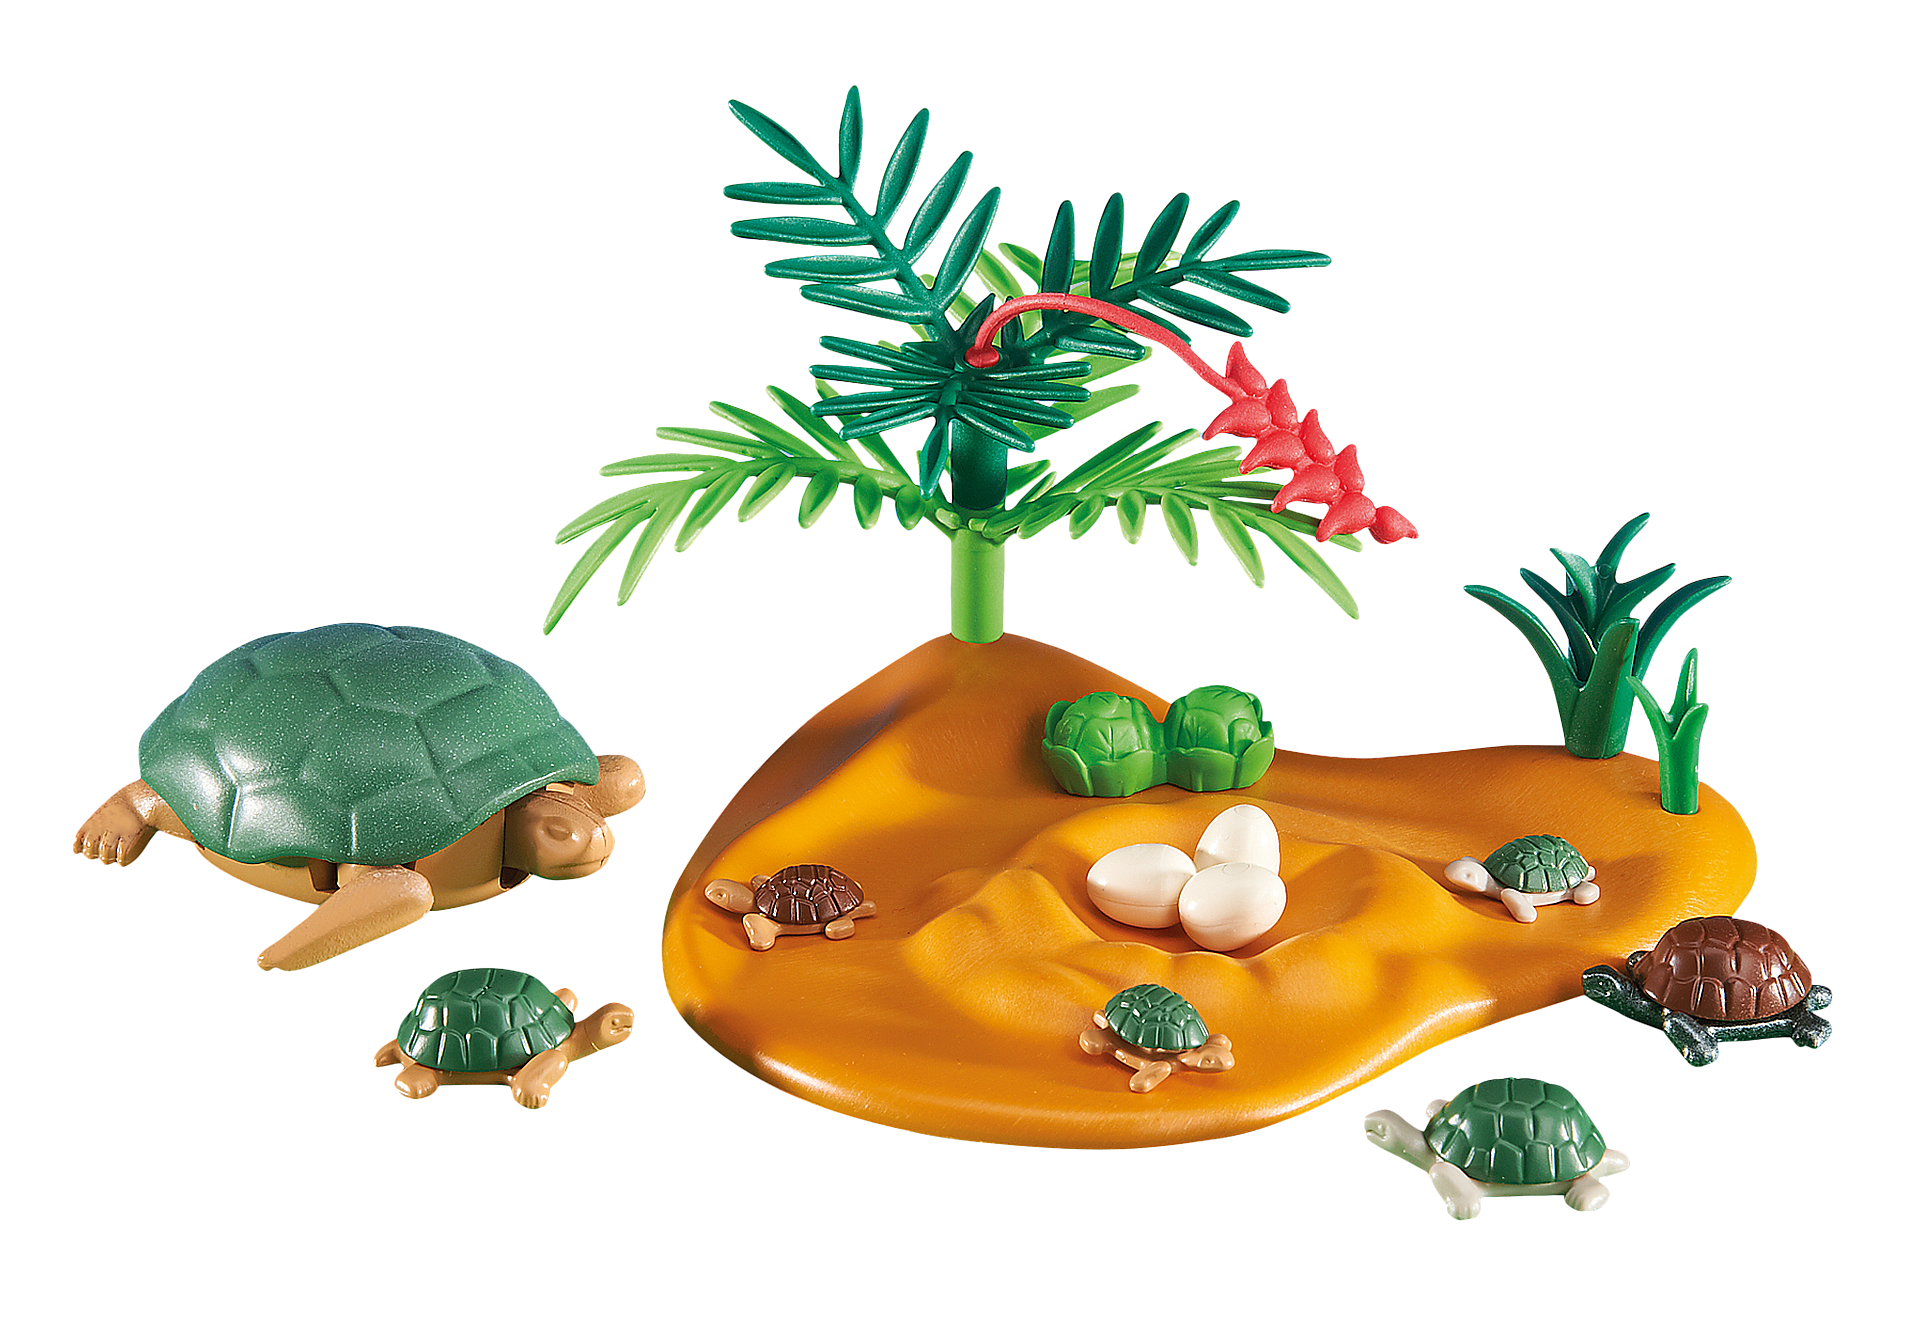 6420 Schildkröte mit Babys zoom image1